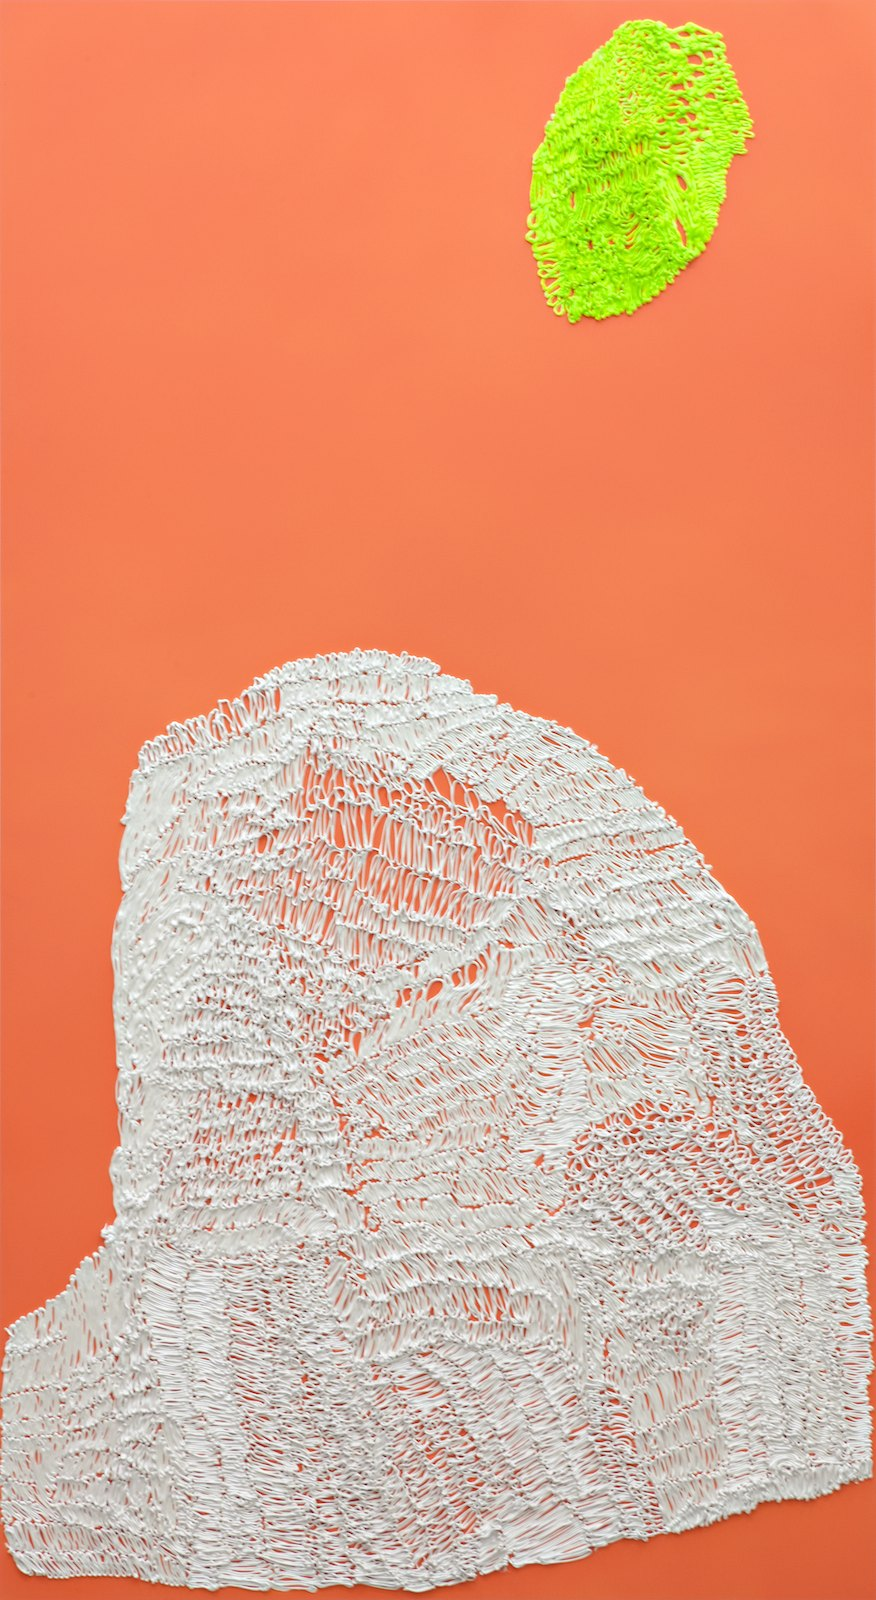 Handmade # 4, 2011-2012, acrylic on alucore, 220 x 120 cm